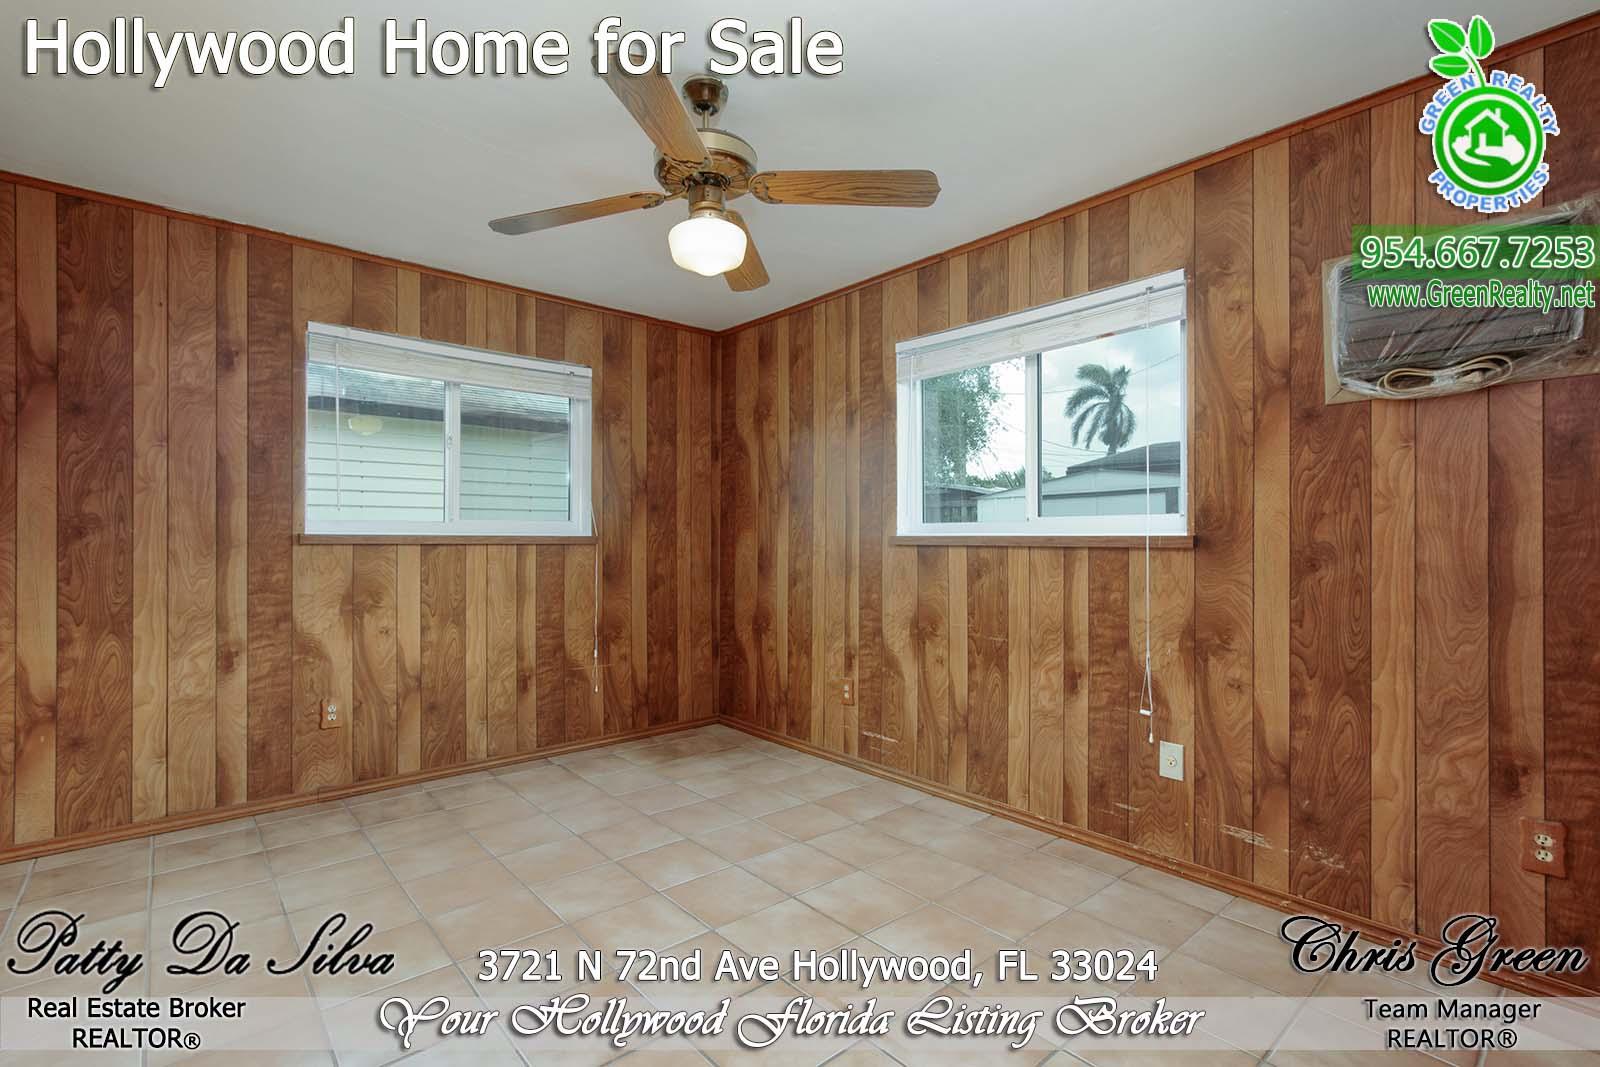 18 Hollywood Florida Real Estate Listing Patty Da Silva Green Realty properties (17)